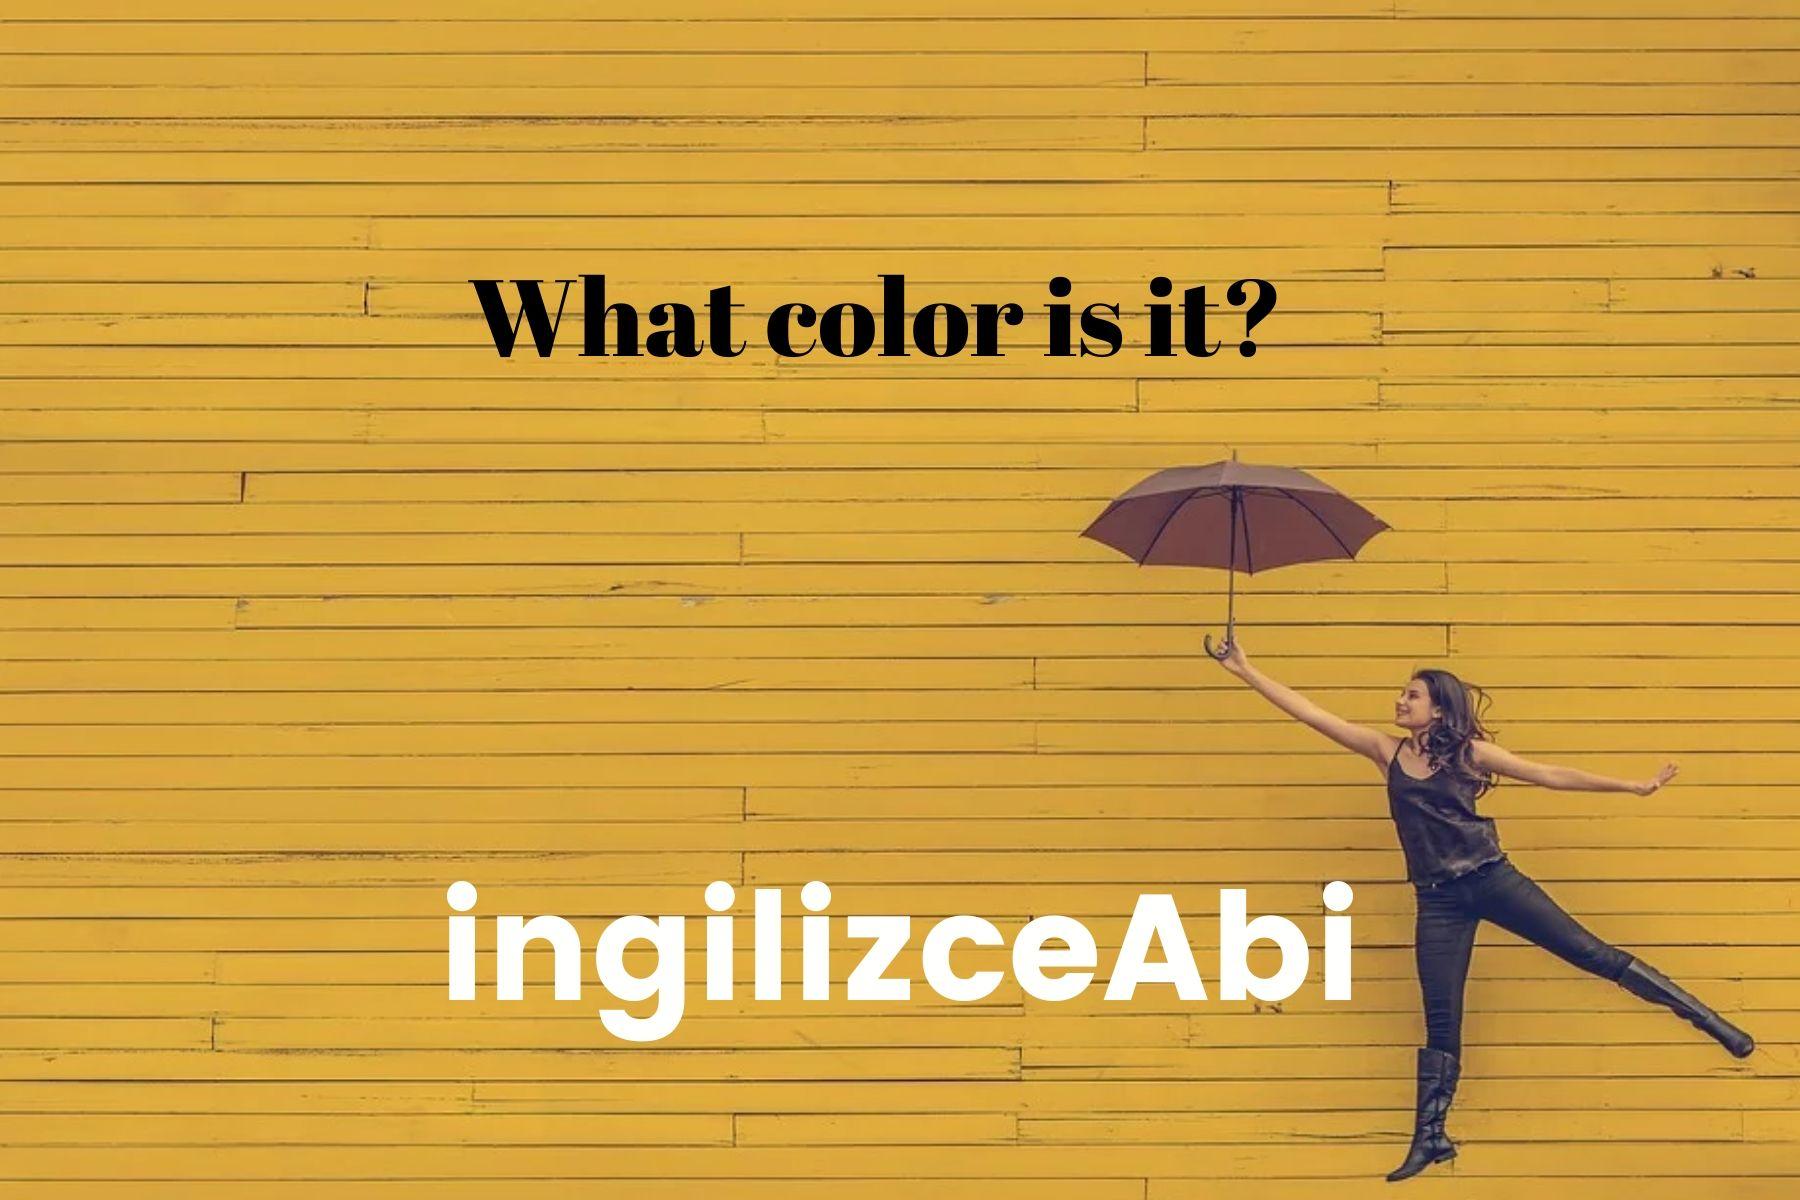 Yellow Wallpaper - ingilizce renkler - ingilizceabi